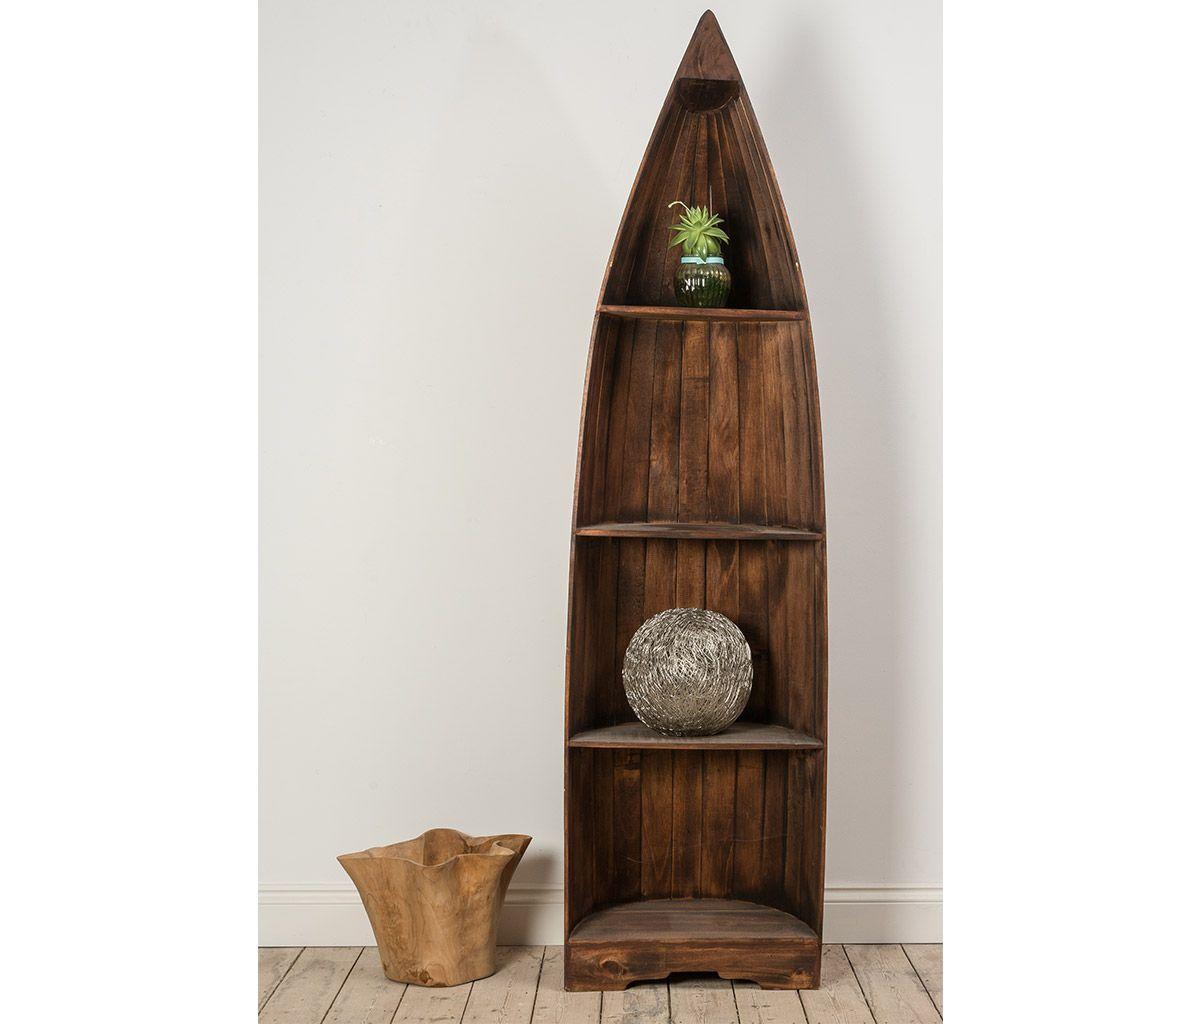 4puji_boat-display-bookcase.jpg